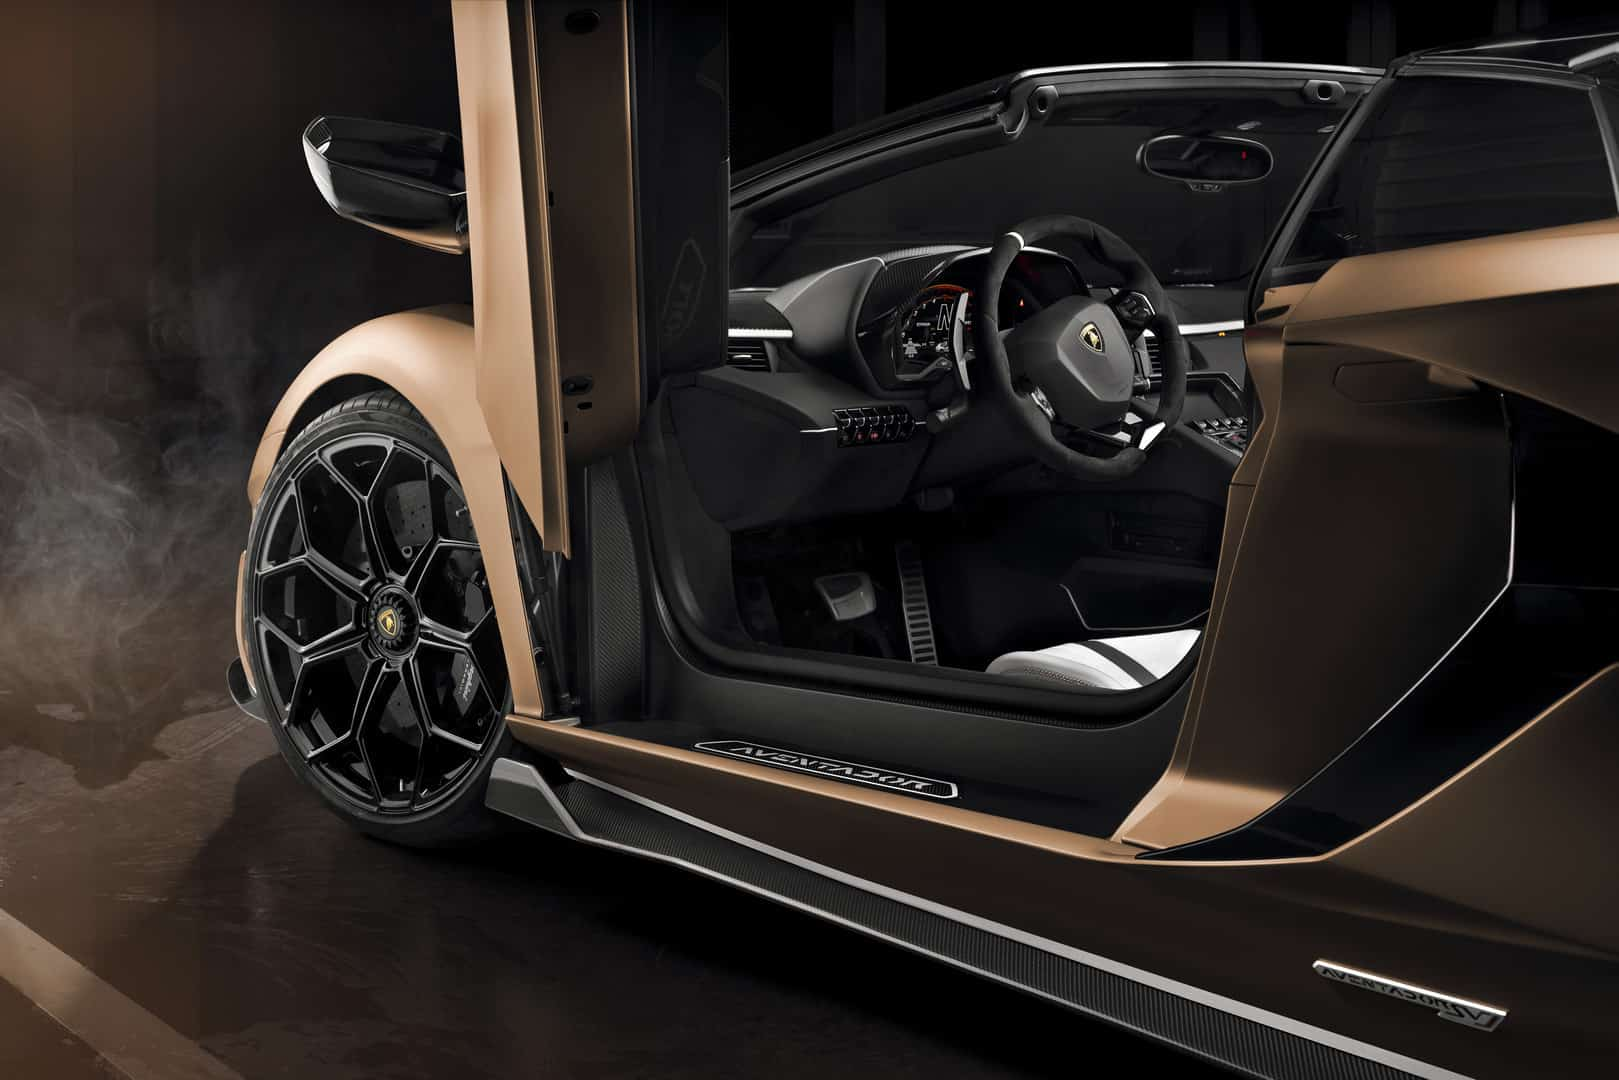 Lamborghini Aventador SVJ Roadster 8